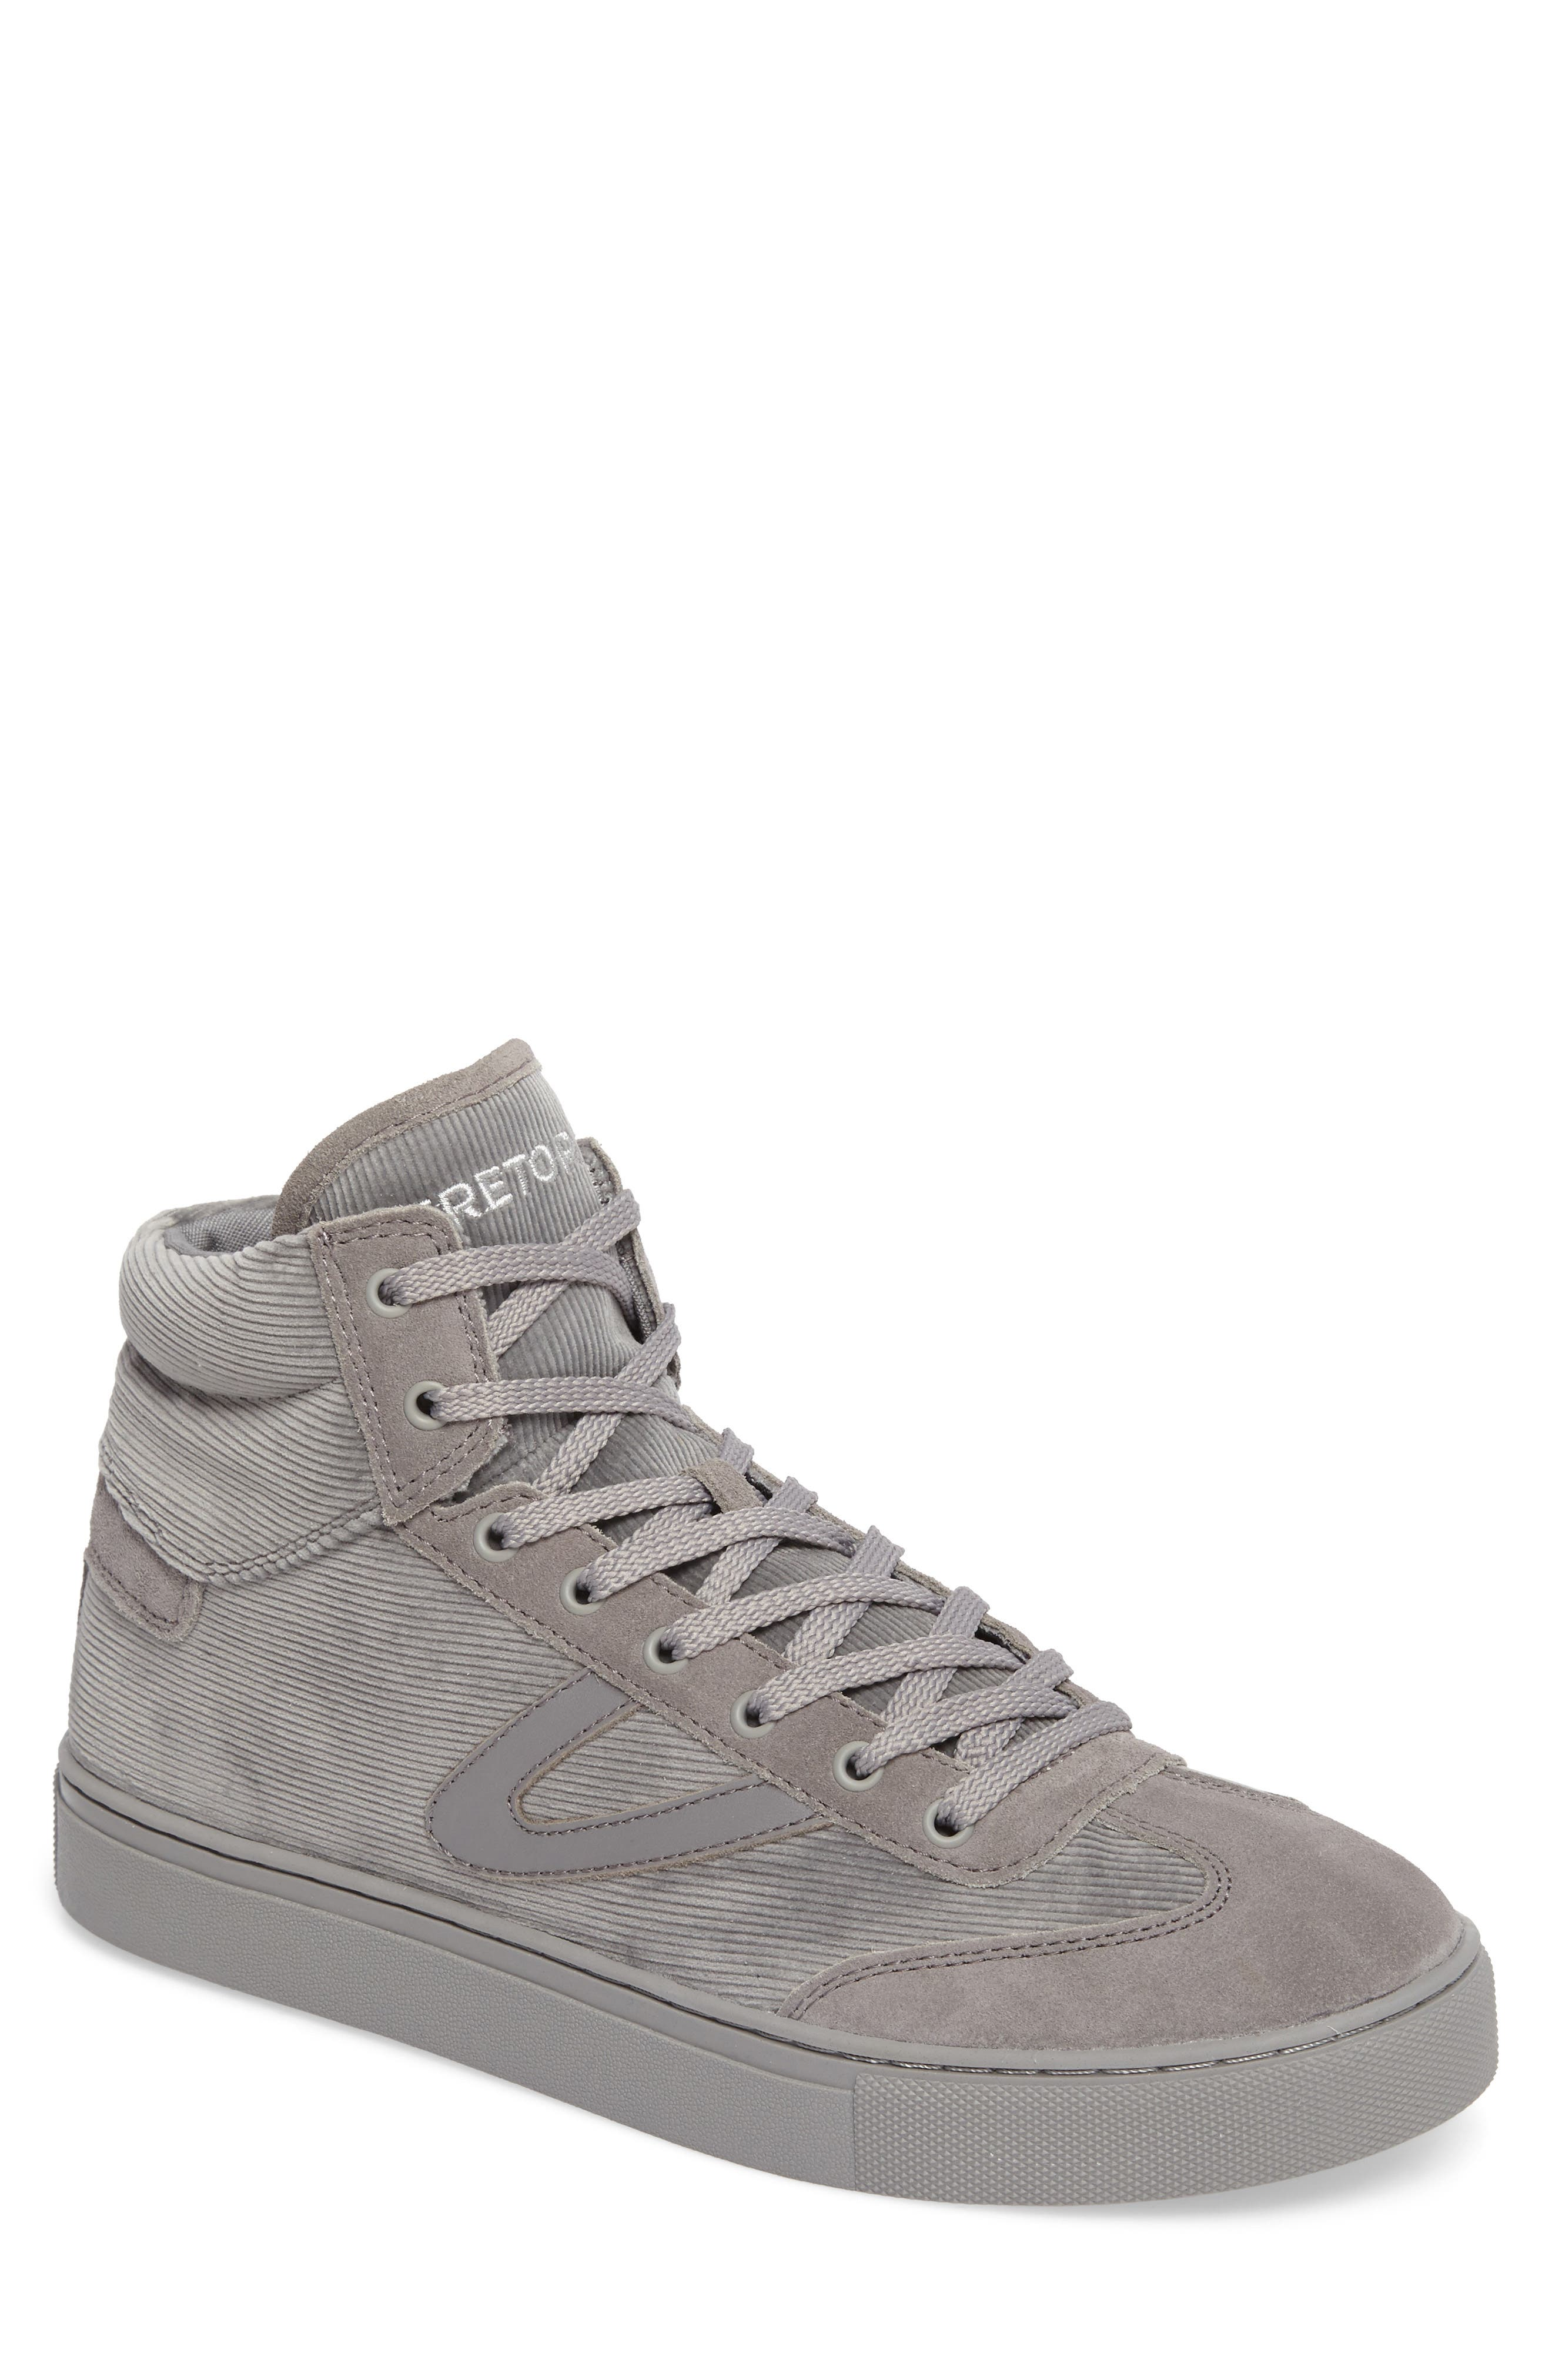 Jack High Top Sneaker,                         Main,                         color, Grey/ Grey